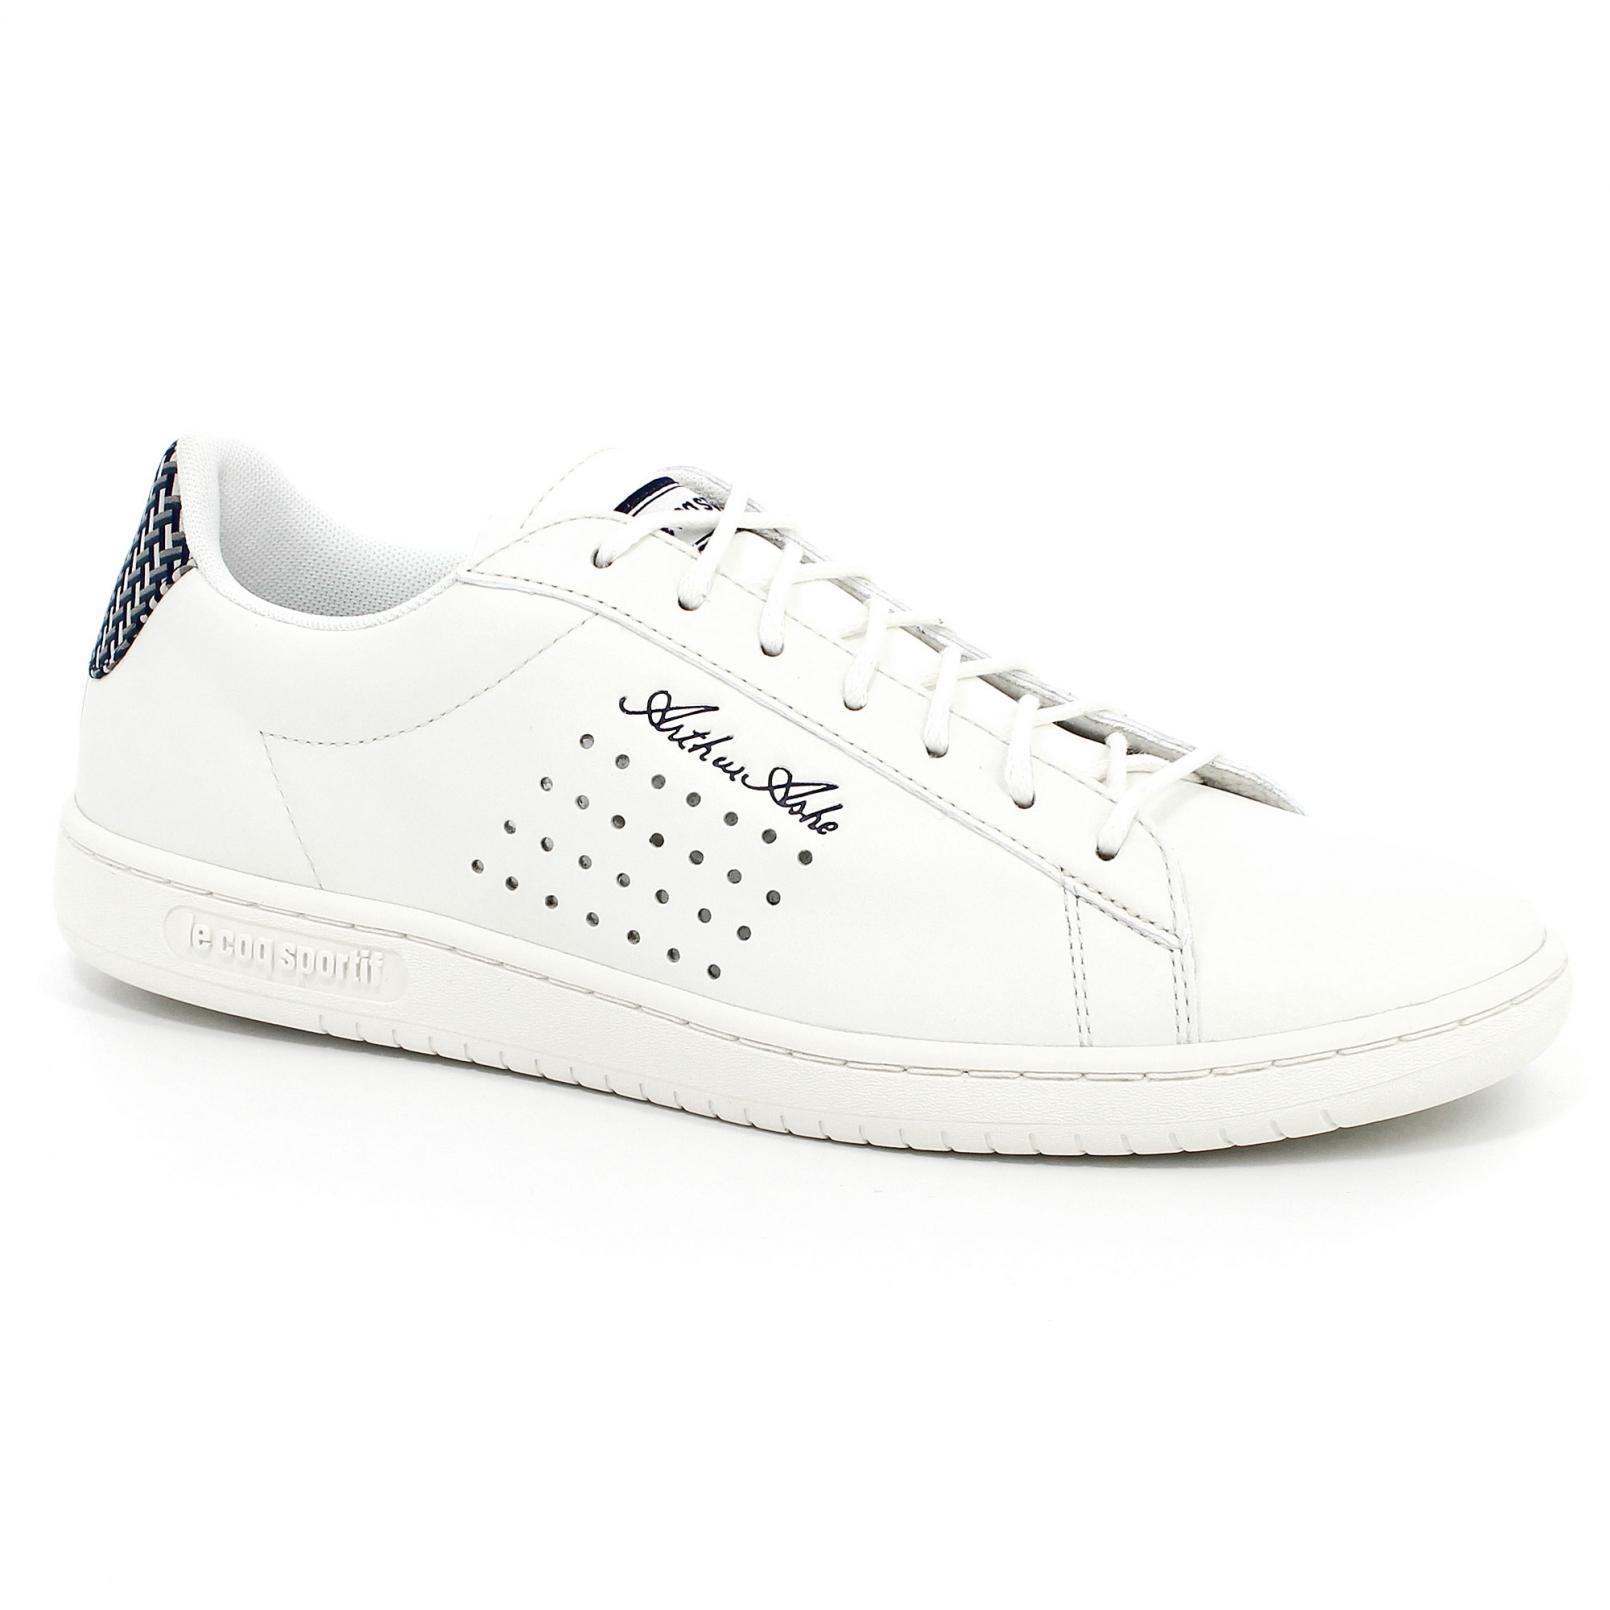 Shoes – Le Coq Sportif Arthur Ashe Geo Jacquard Cream/Grey